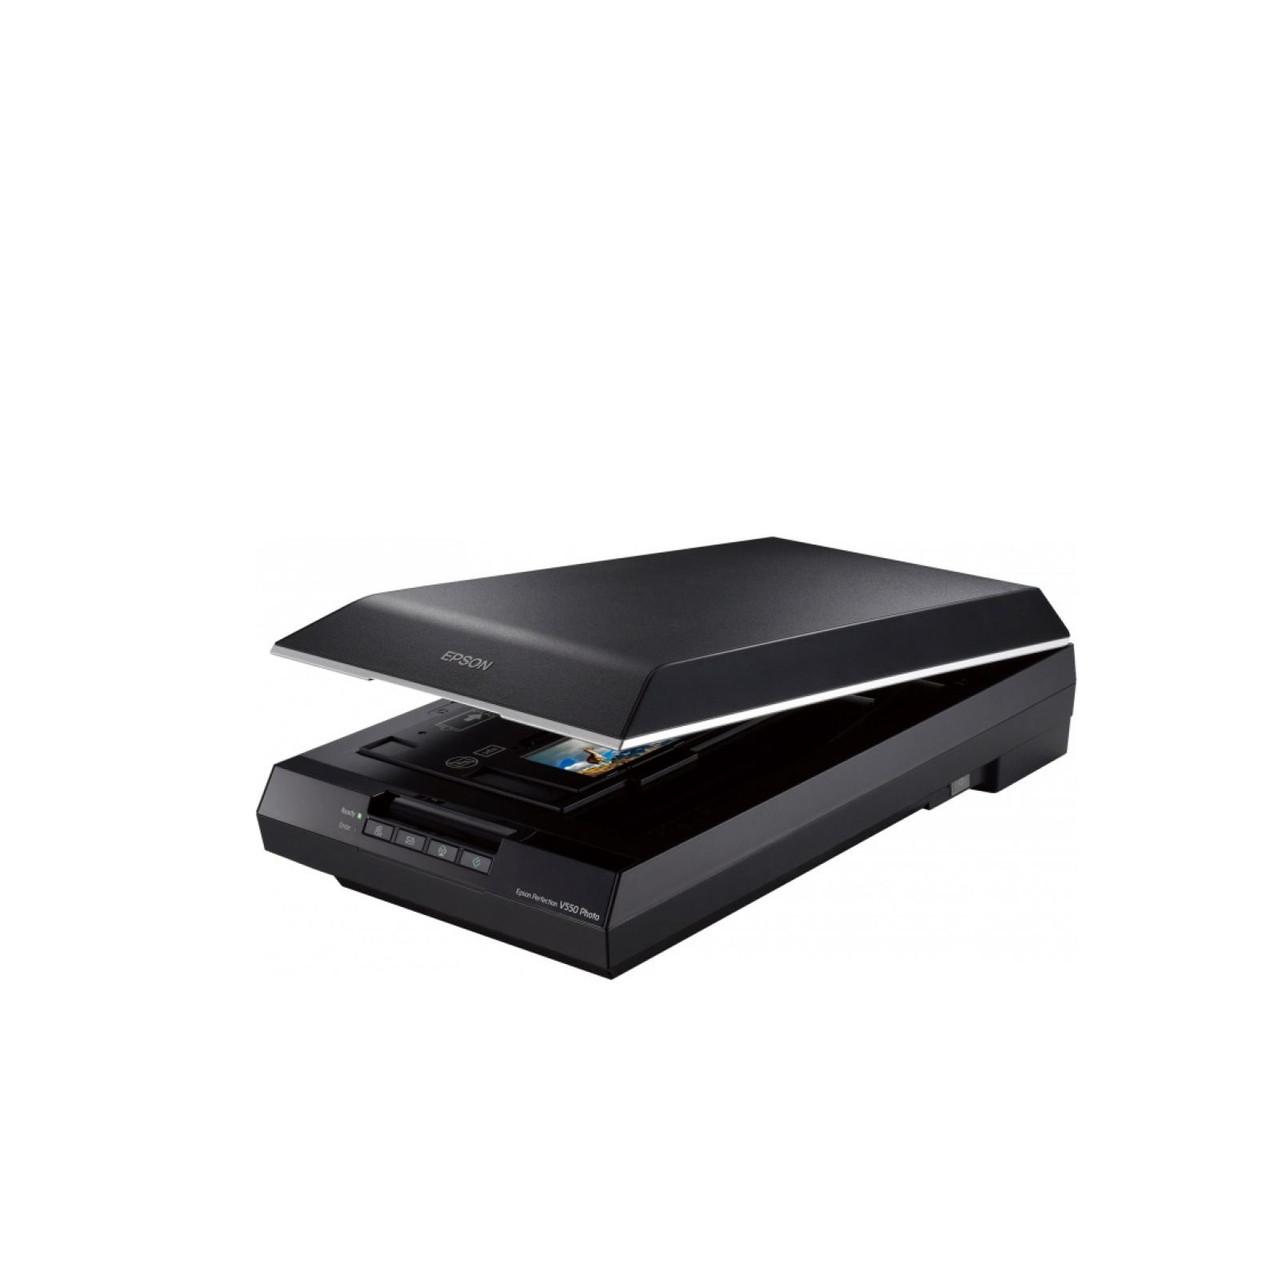 Планшетный сканер Epson Perfection V550 Photo (А4 USB) B11B210303